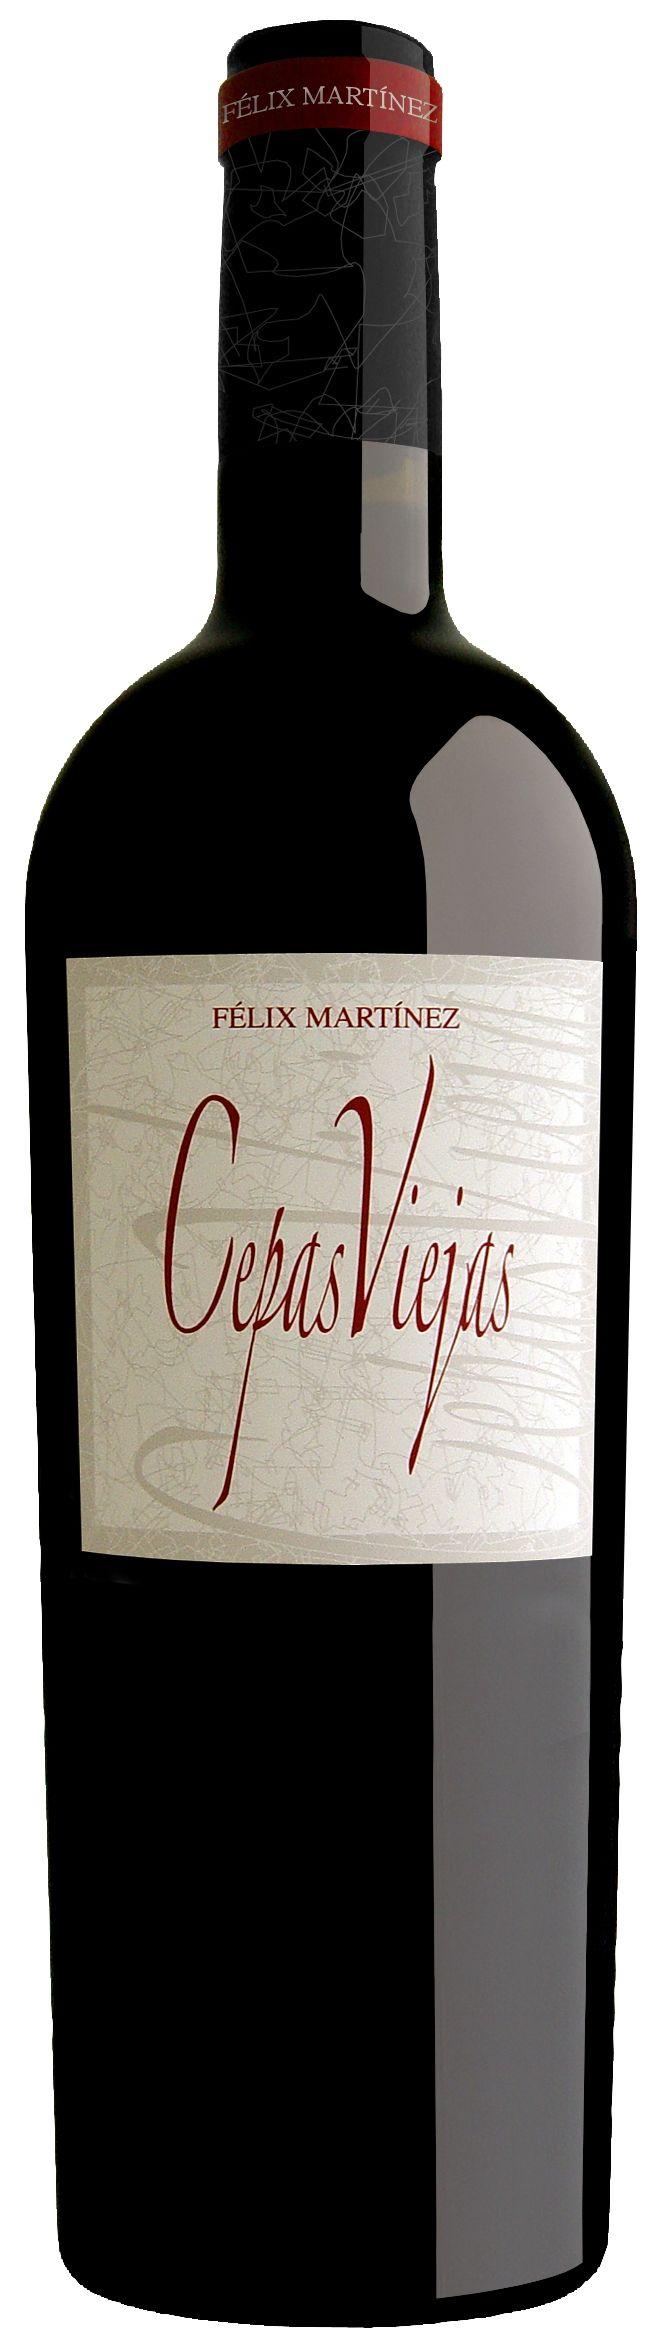 "Félix Martínez ""Cepas Viejas"" Reserva 2012."